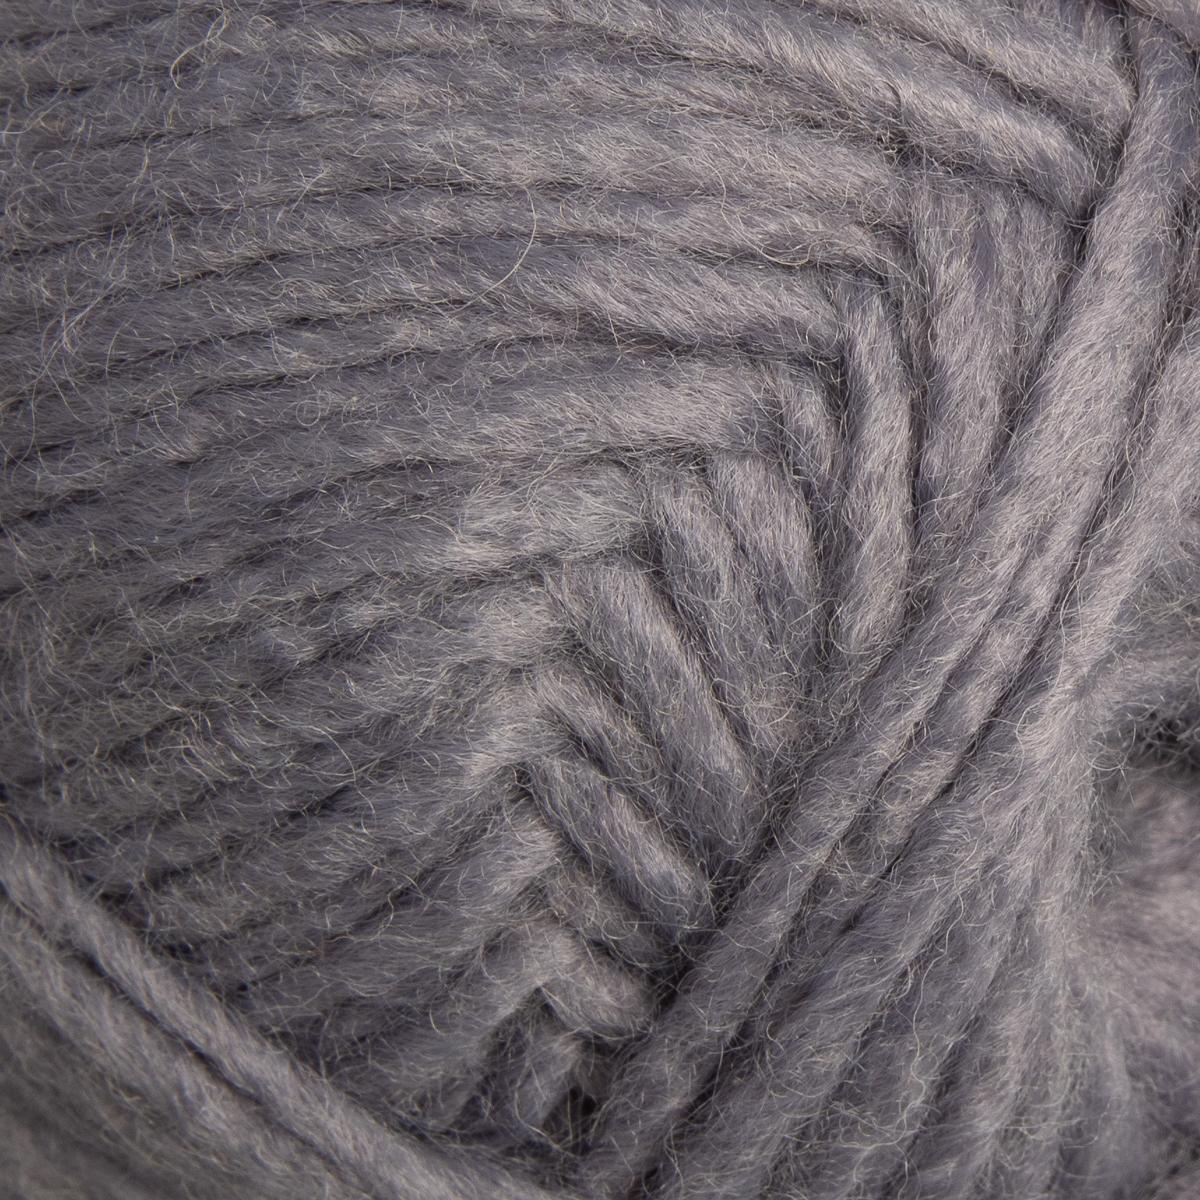 3pk-Lion-Brand-New-Basic-Acrylic-amp-Wool-Yarn-Medium-4-Knit-Crochet-Skeins-Soft thumbnail 51